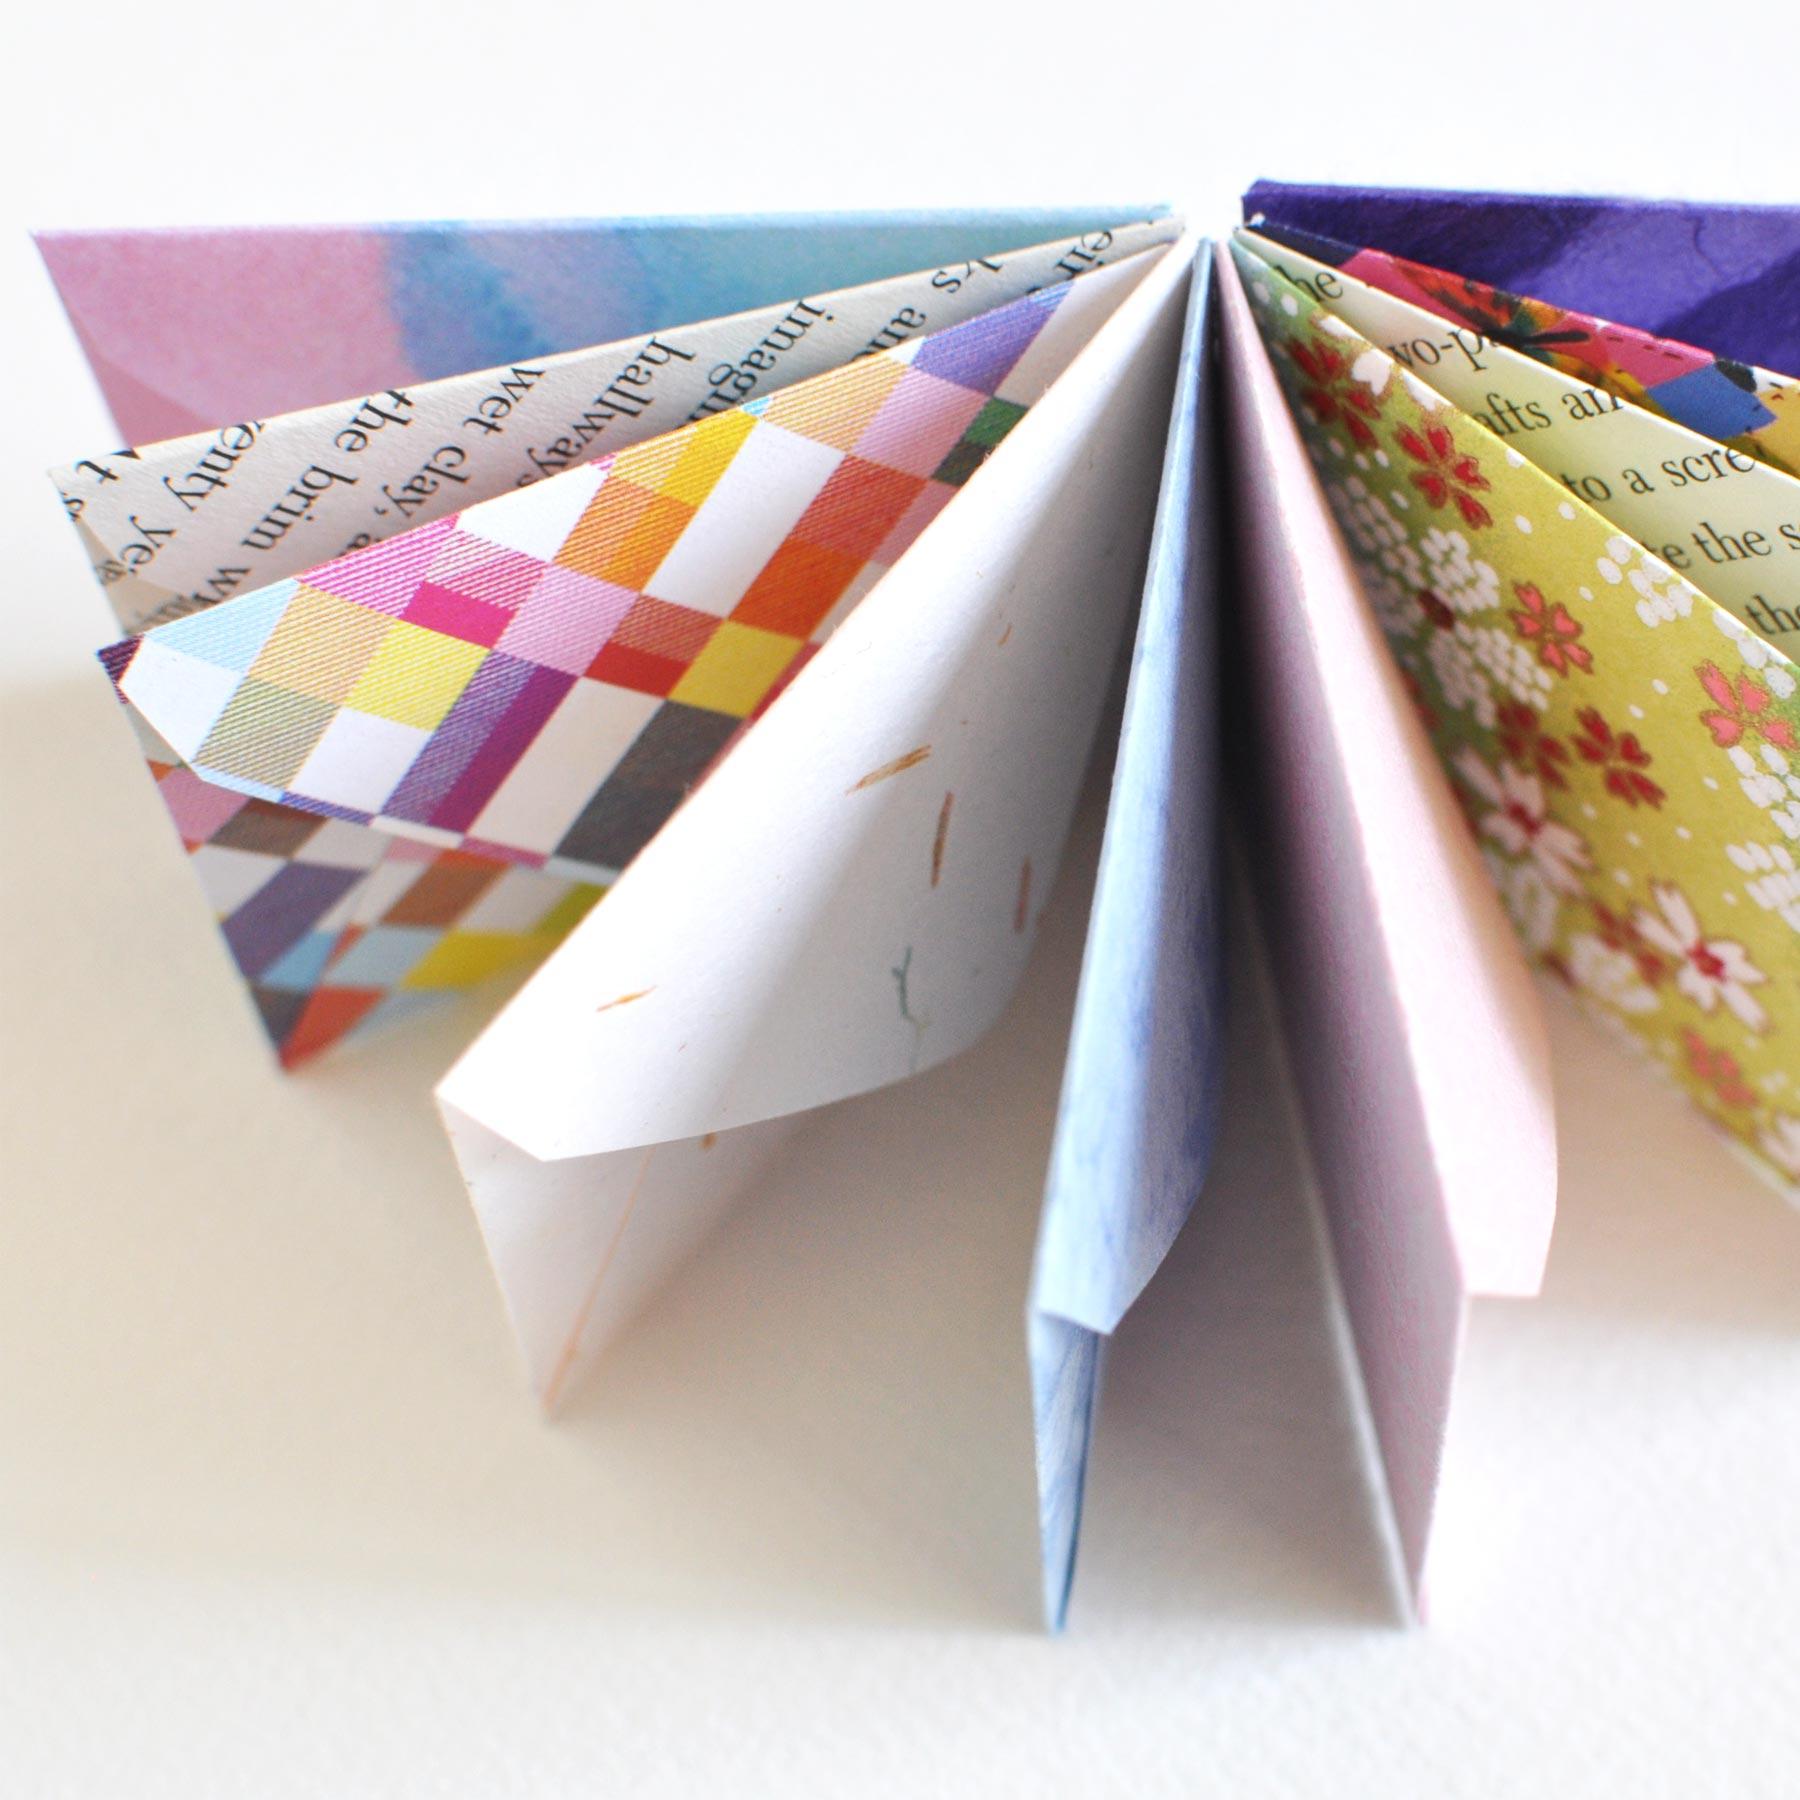 Envelope-Journal-Image-9.jpg